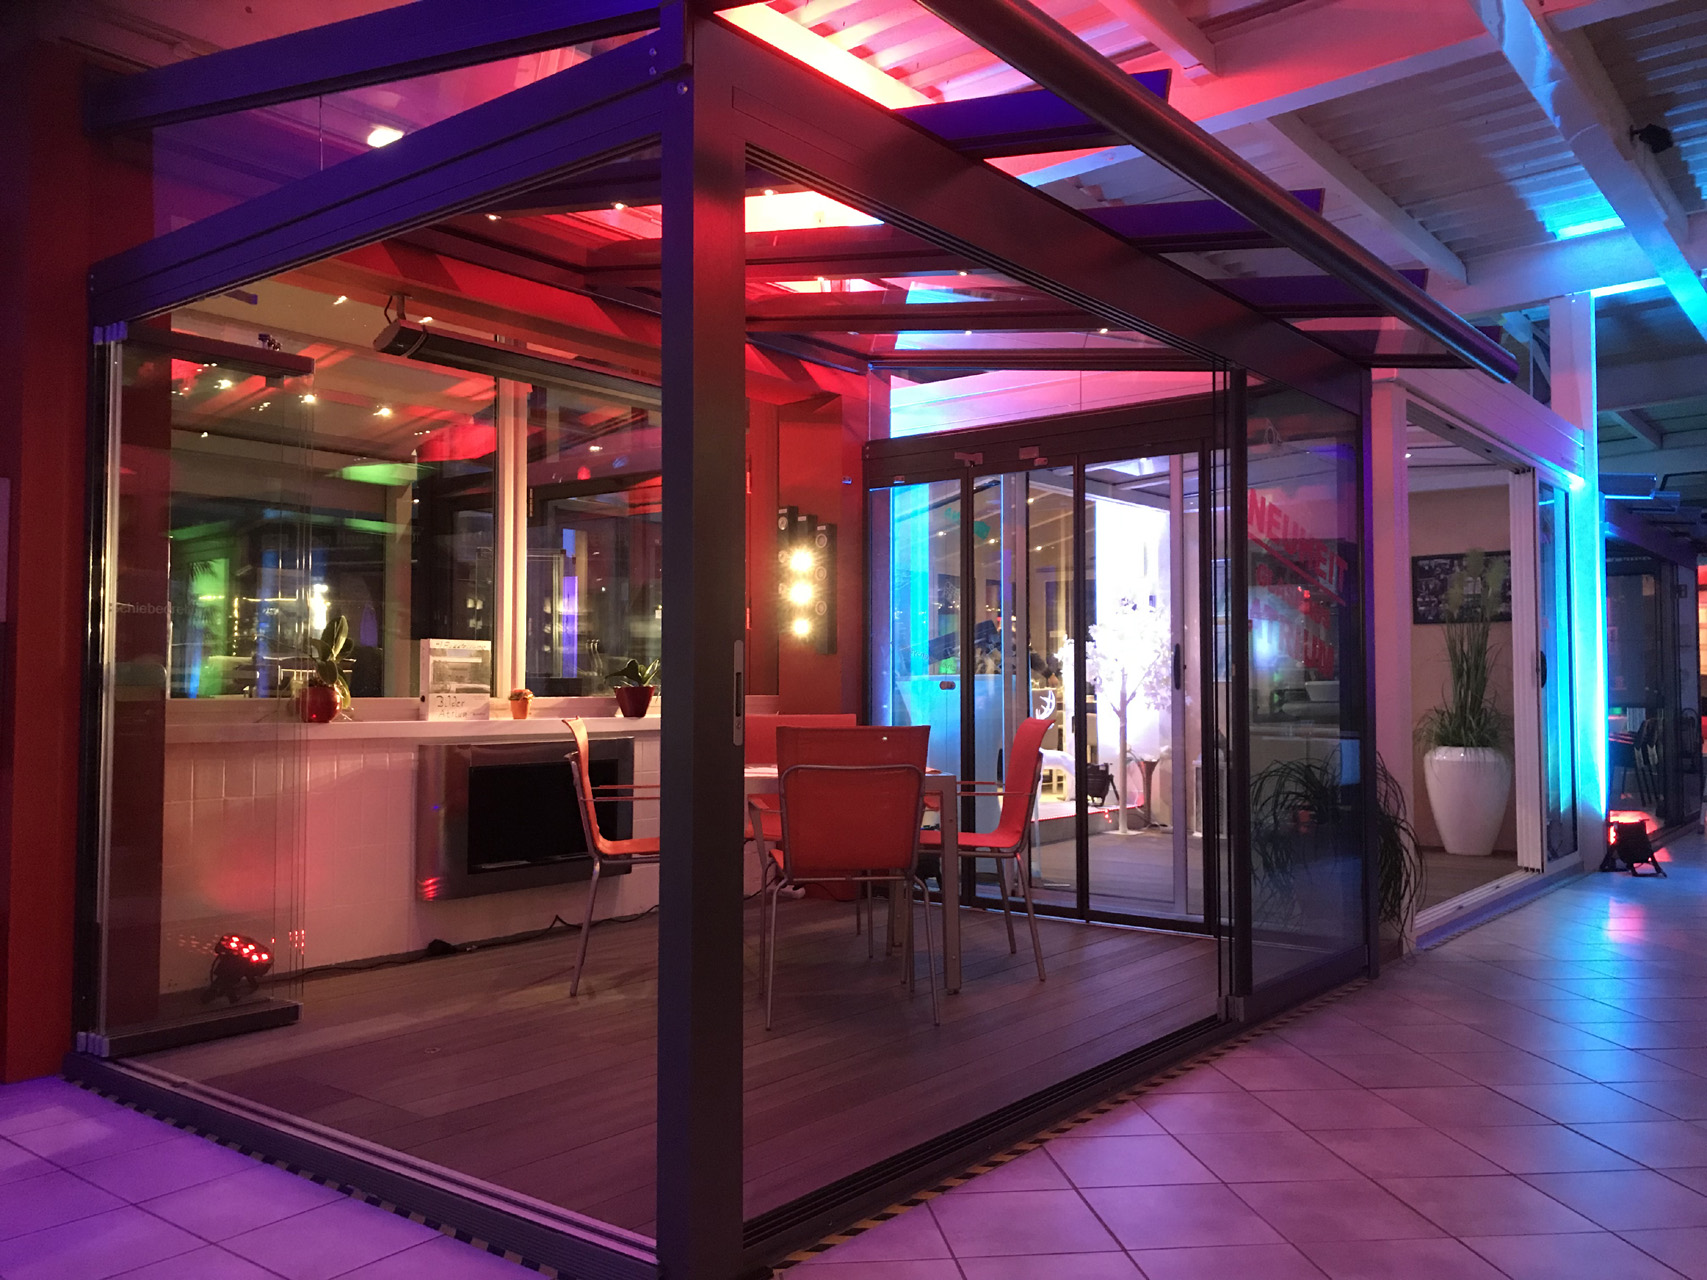 galerie events fortuna wintgergarten. Black Bedroom Furniture Sets. Home Design Ideas